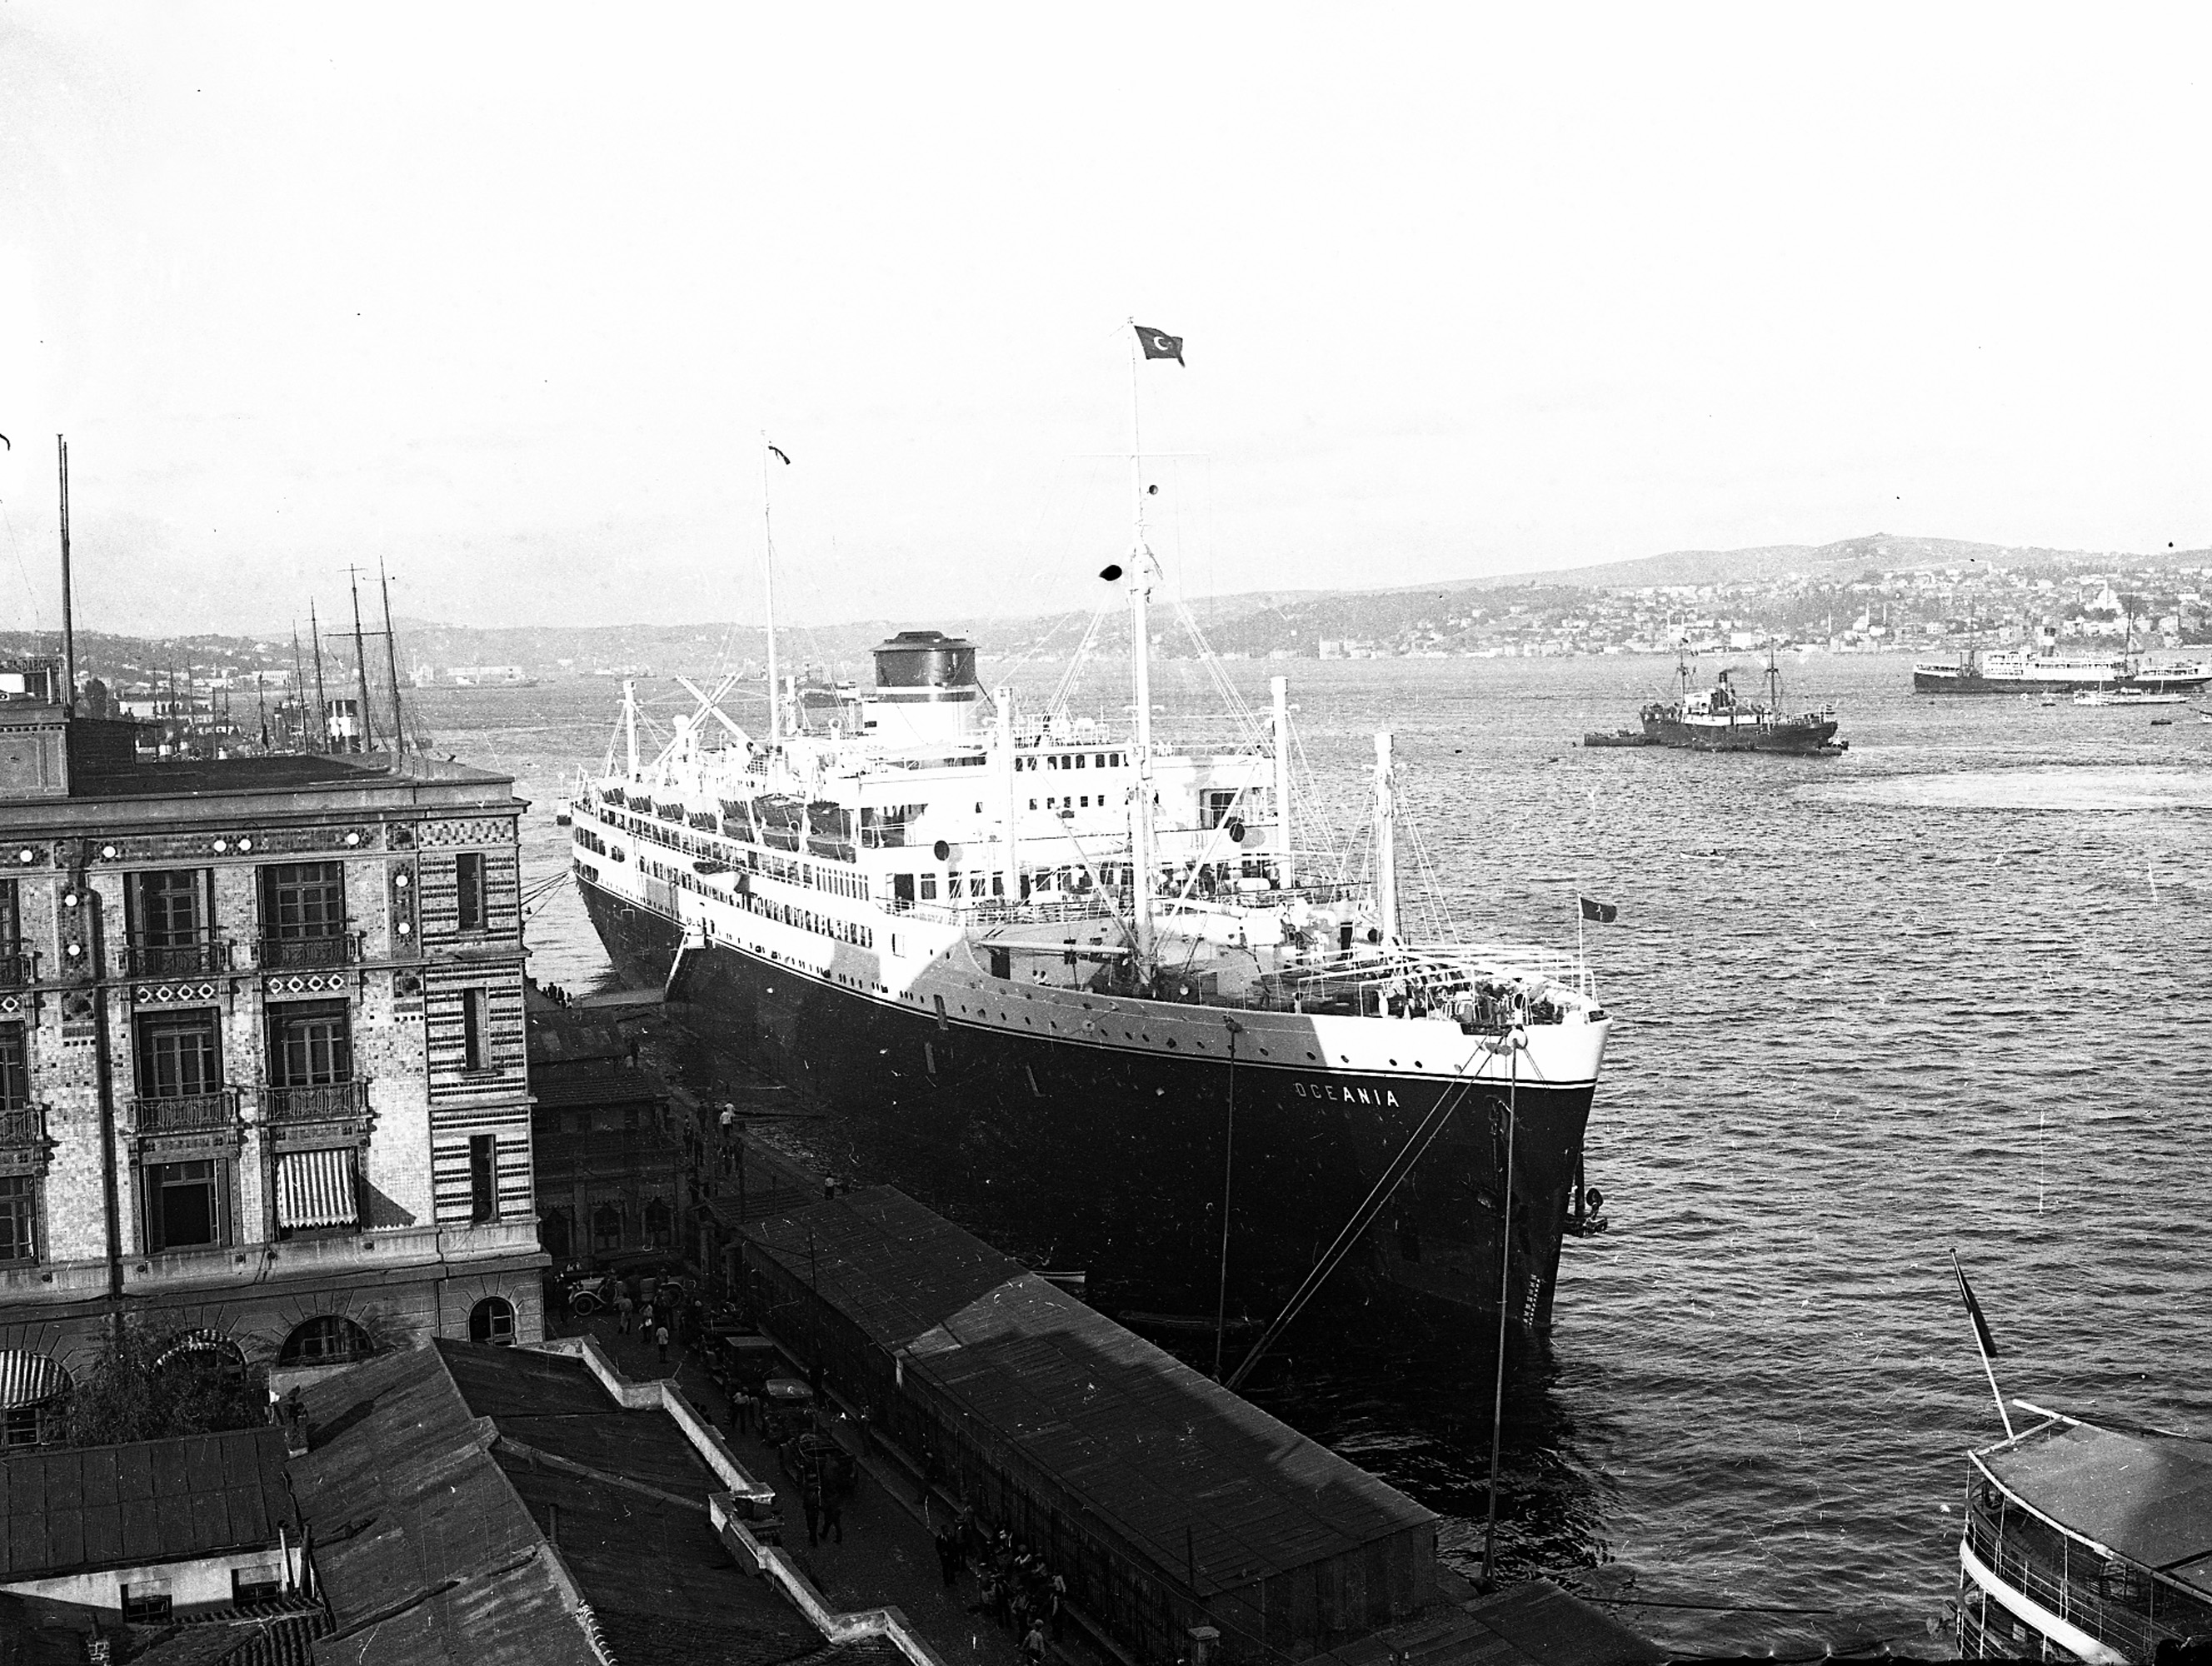 Oceania cruise ship at Karaköy pier.